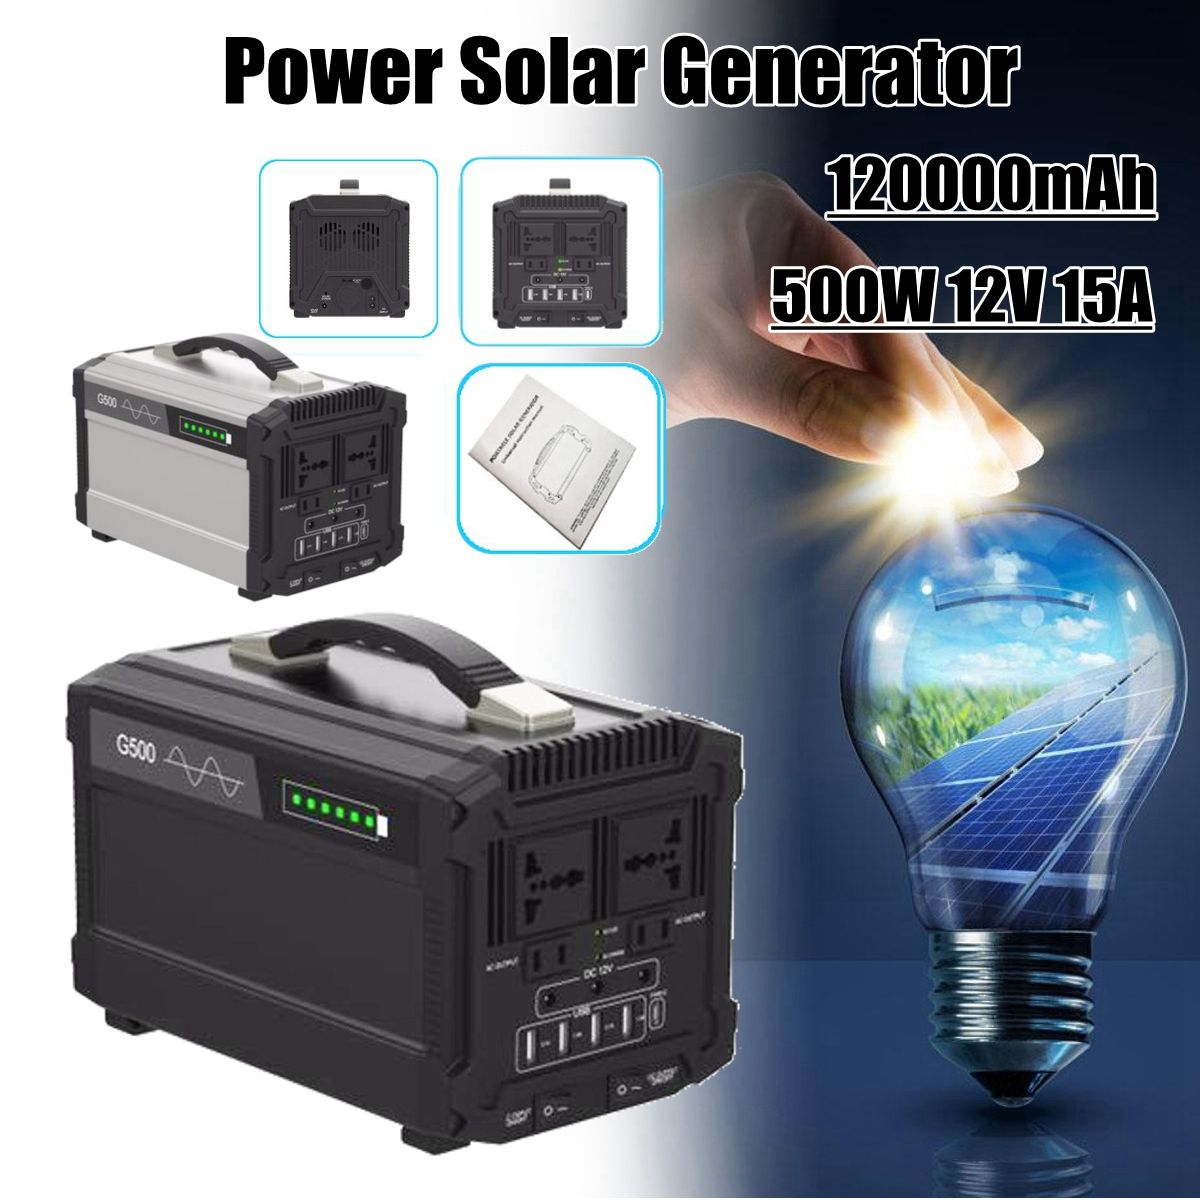 444Wh 120000 mah 500 watt 12 v 15A Energie Lagerung Hause Outdoor Tragbare Strom Solar Generator Schneller Ladung